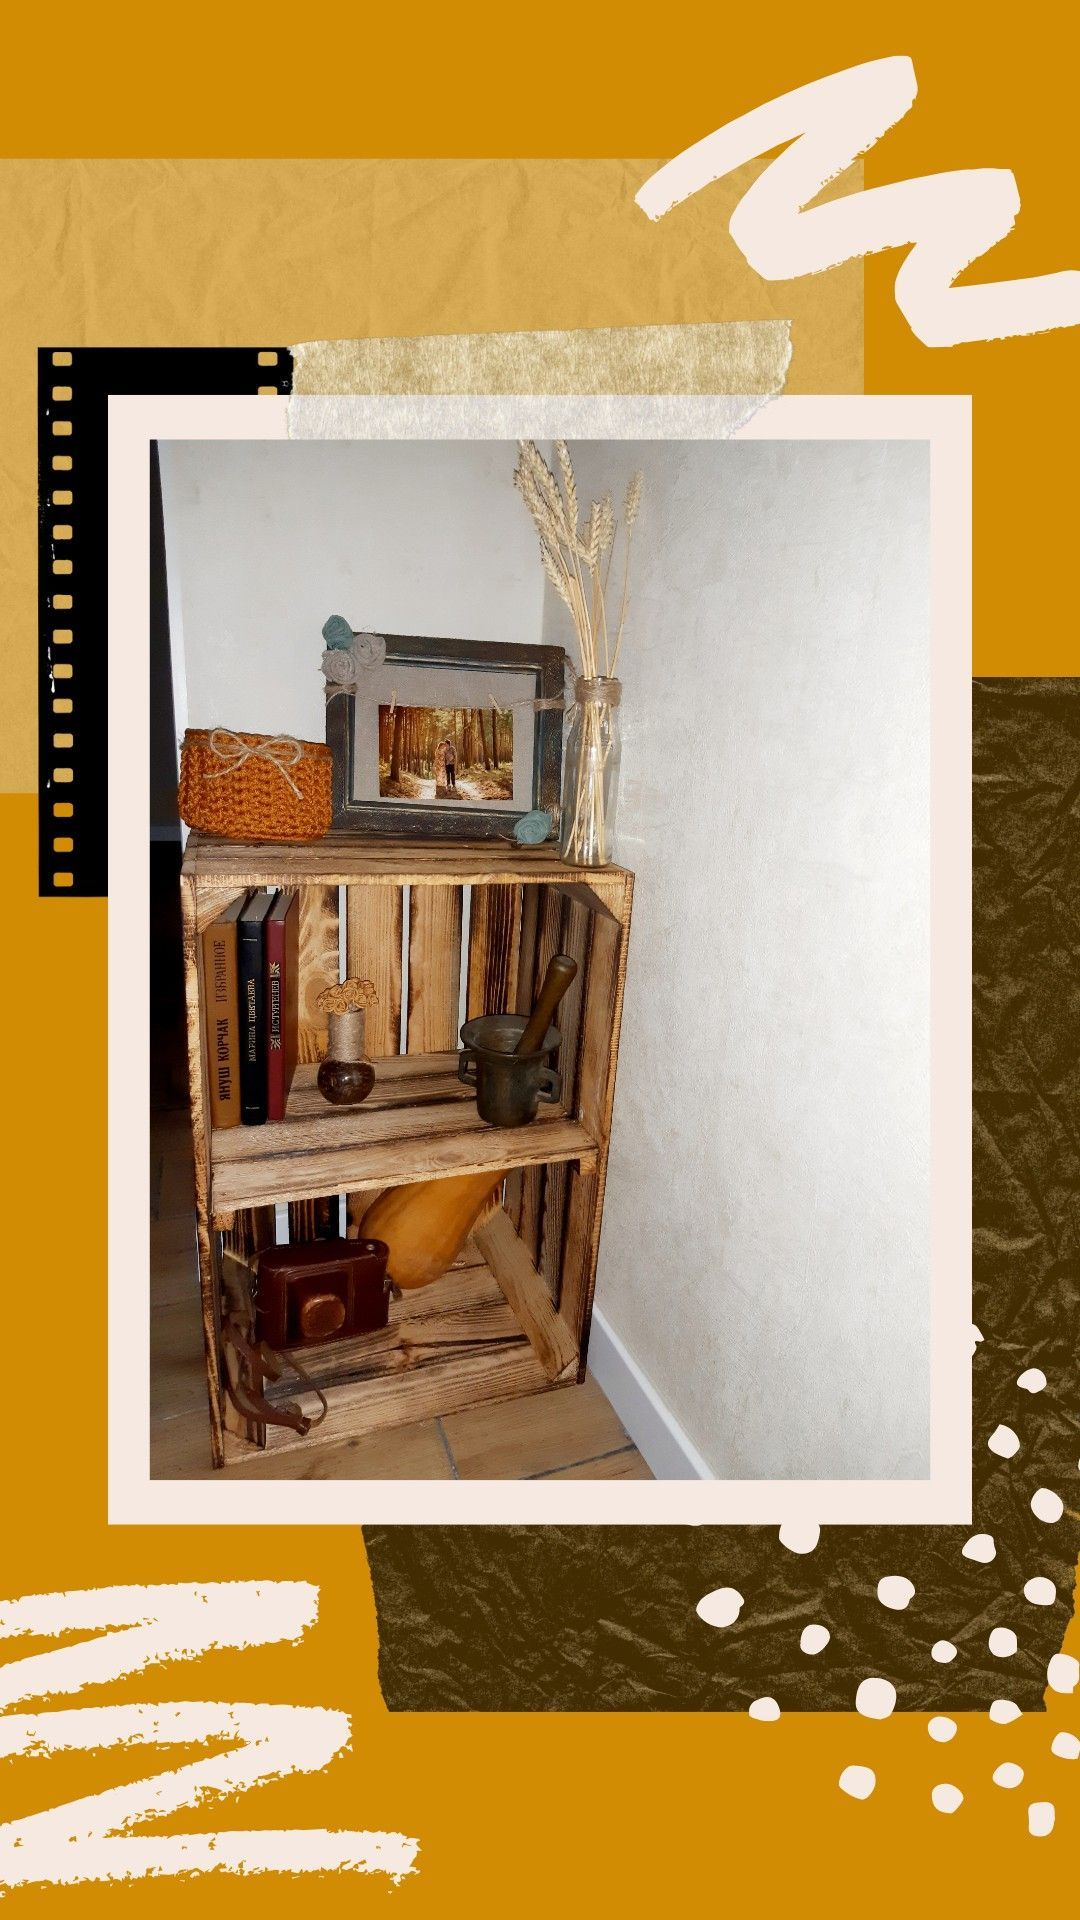 Mustard Crochet Basket Rustic home decor #crochetbowl Mustard crochet basket i…